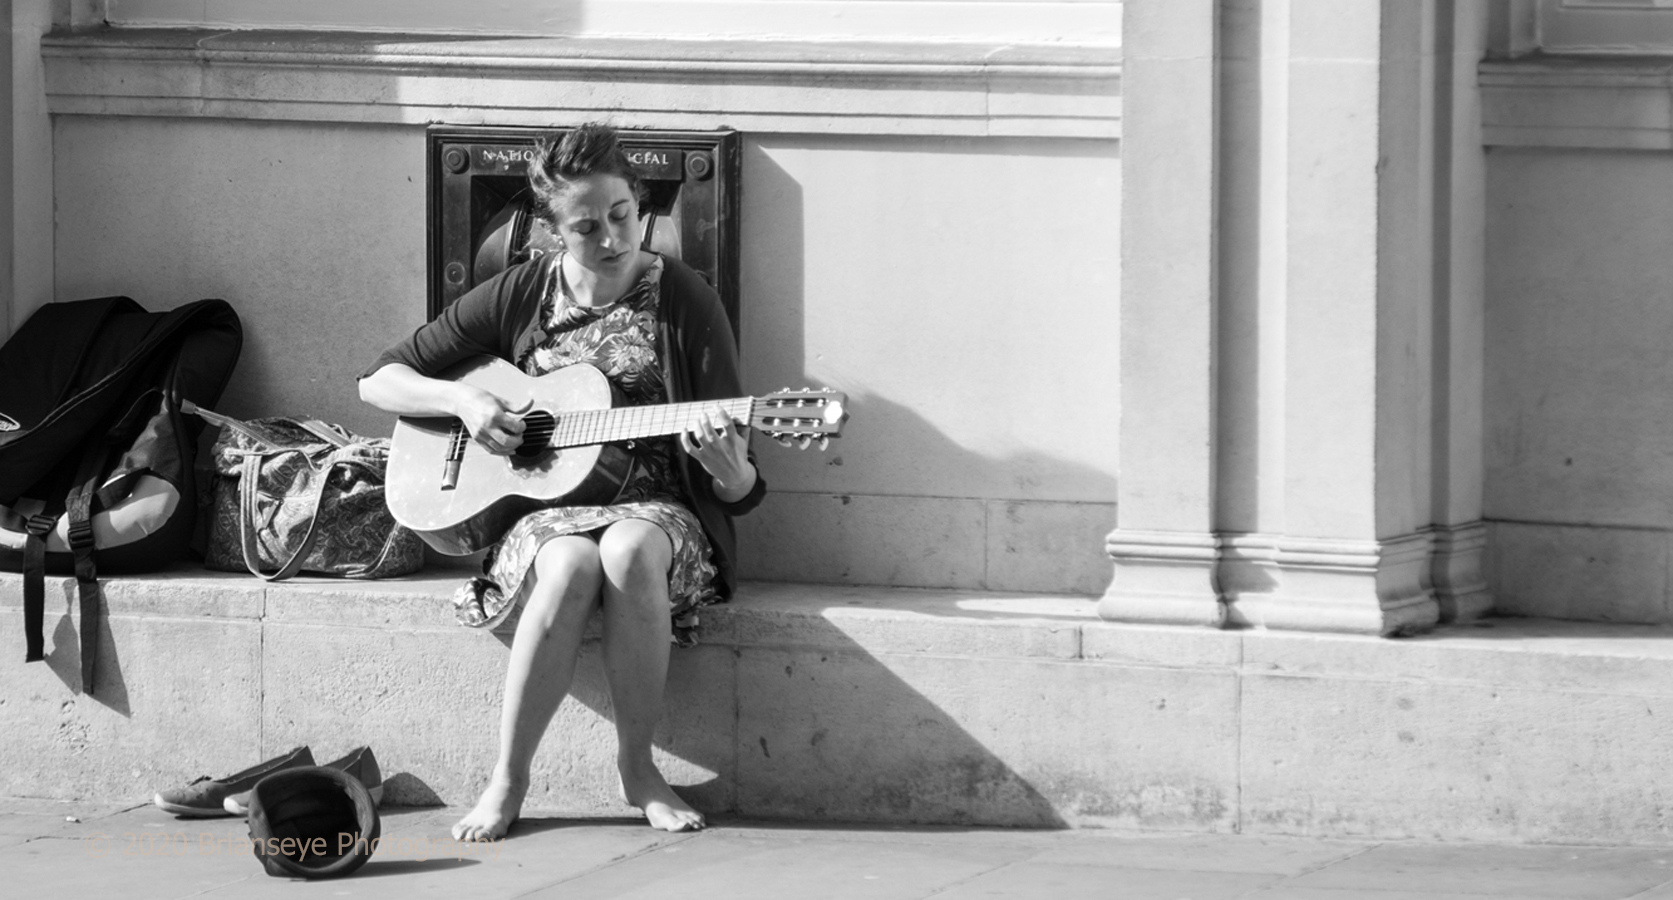 Loneliness of street musician